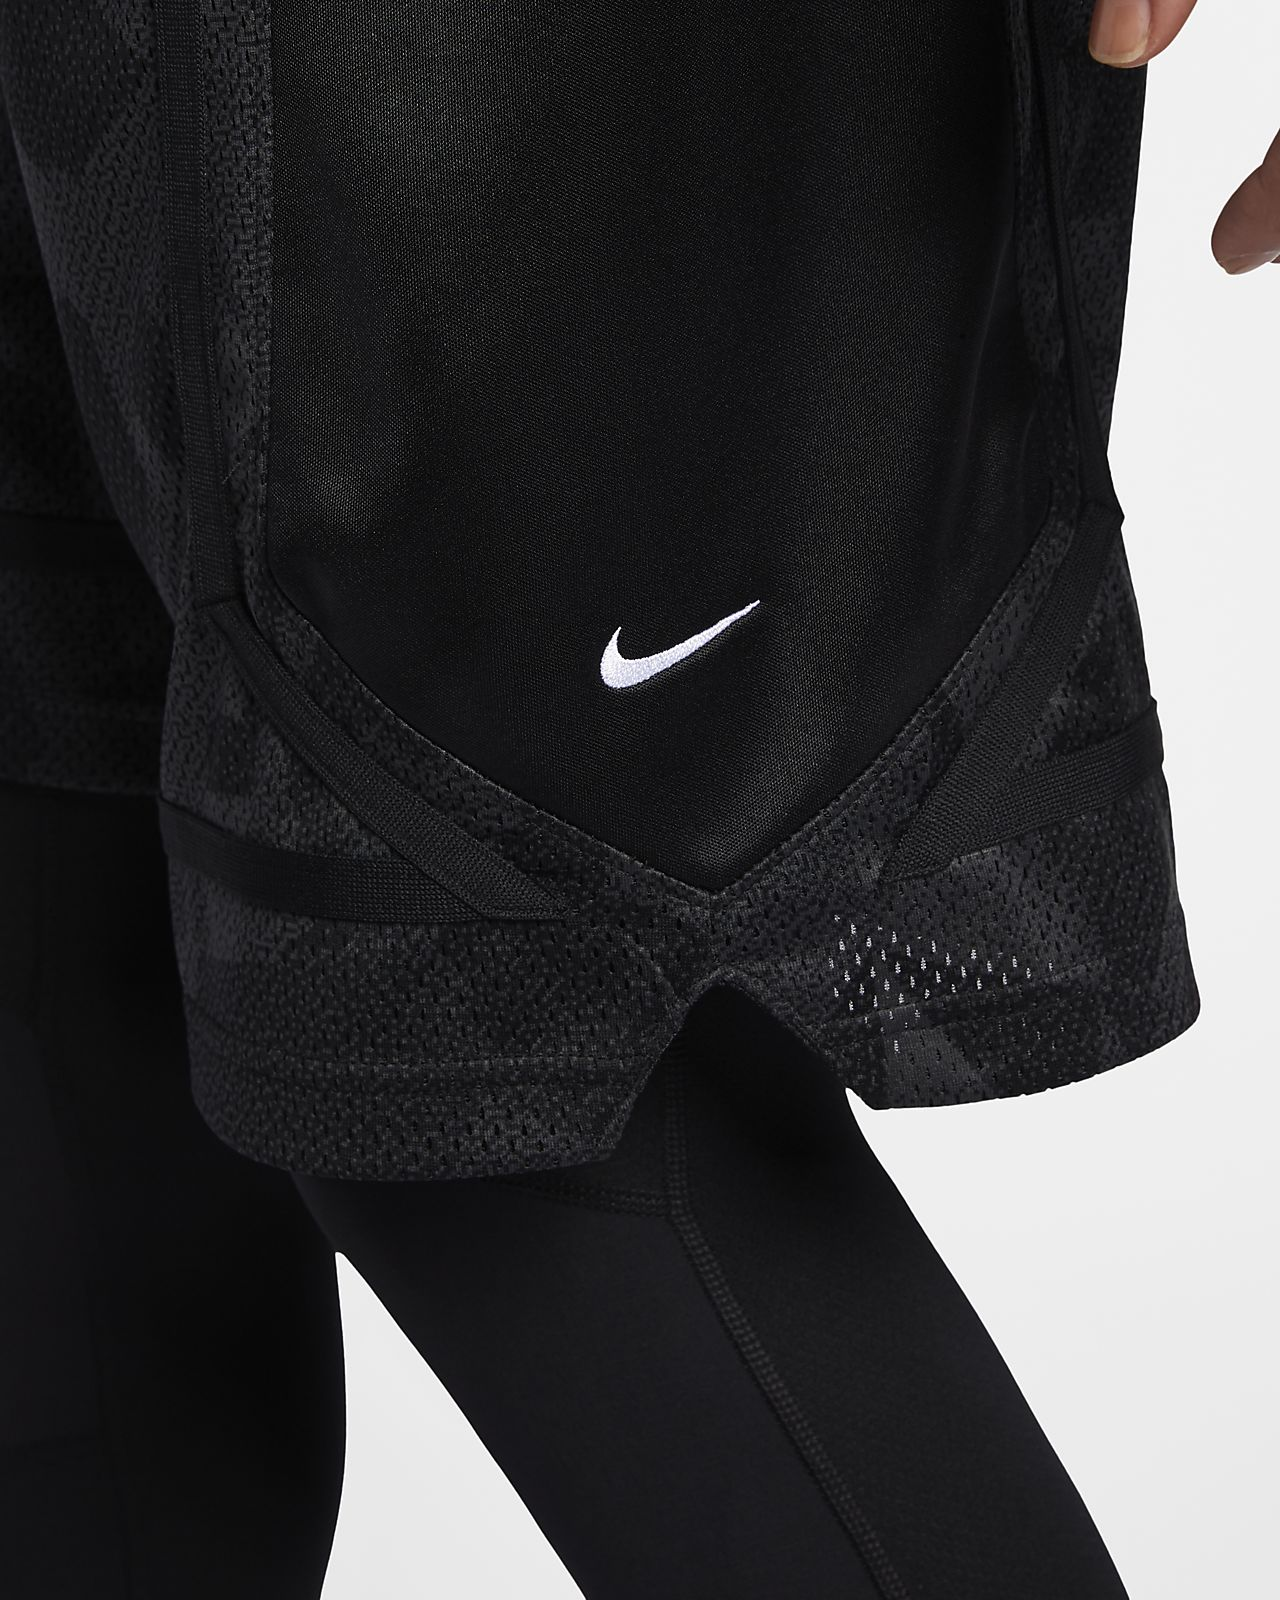 330904d3ad43 Kyrie Dri-FIT Elite Men s Basketball Shorts. Nike.com